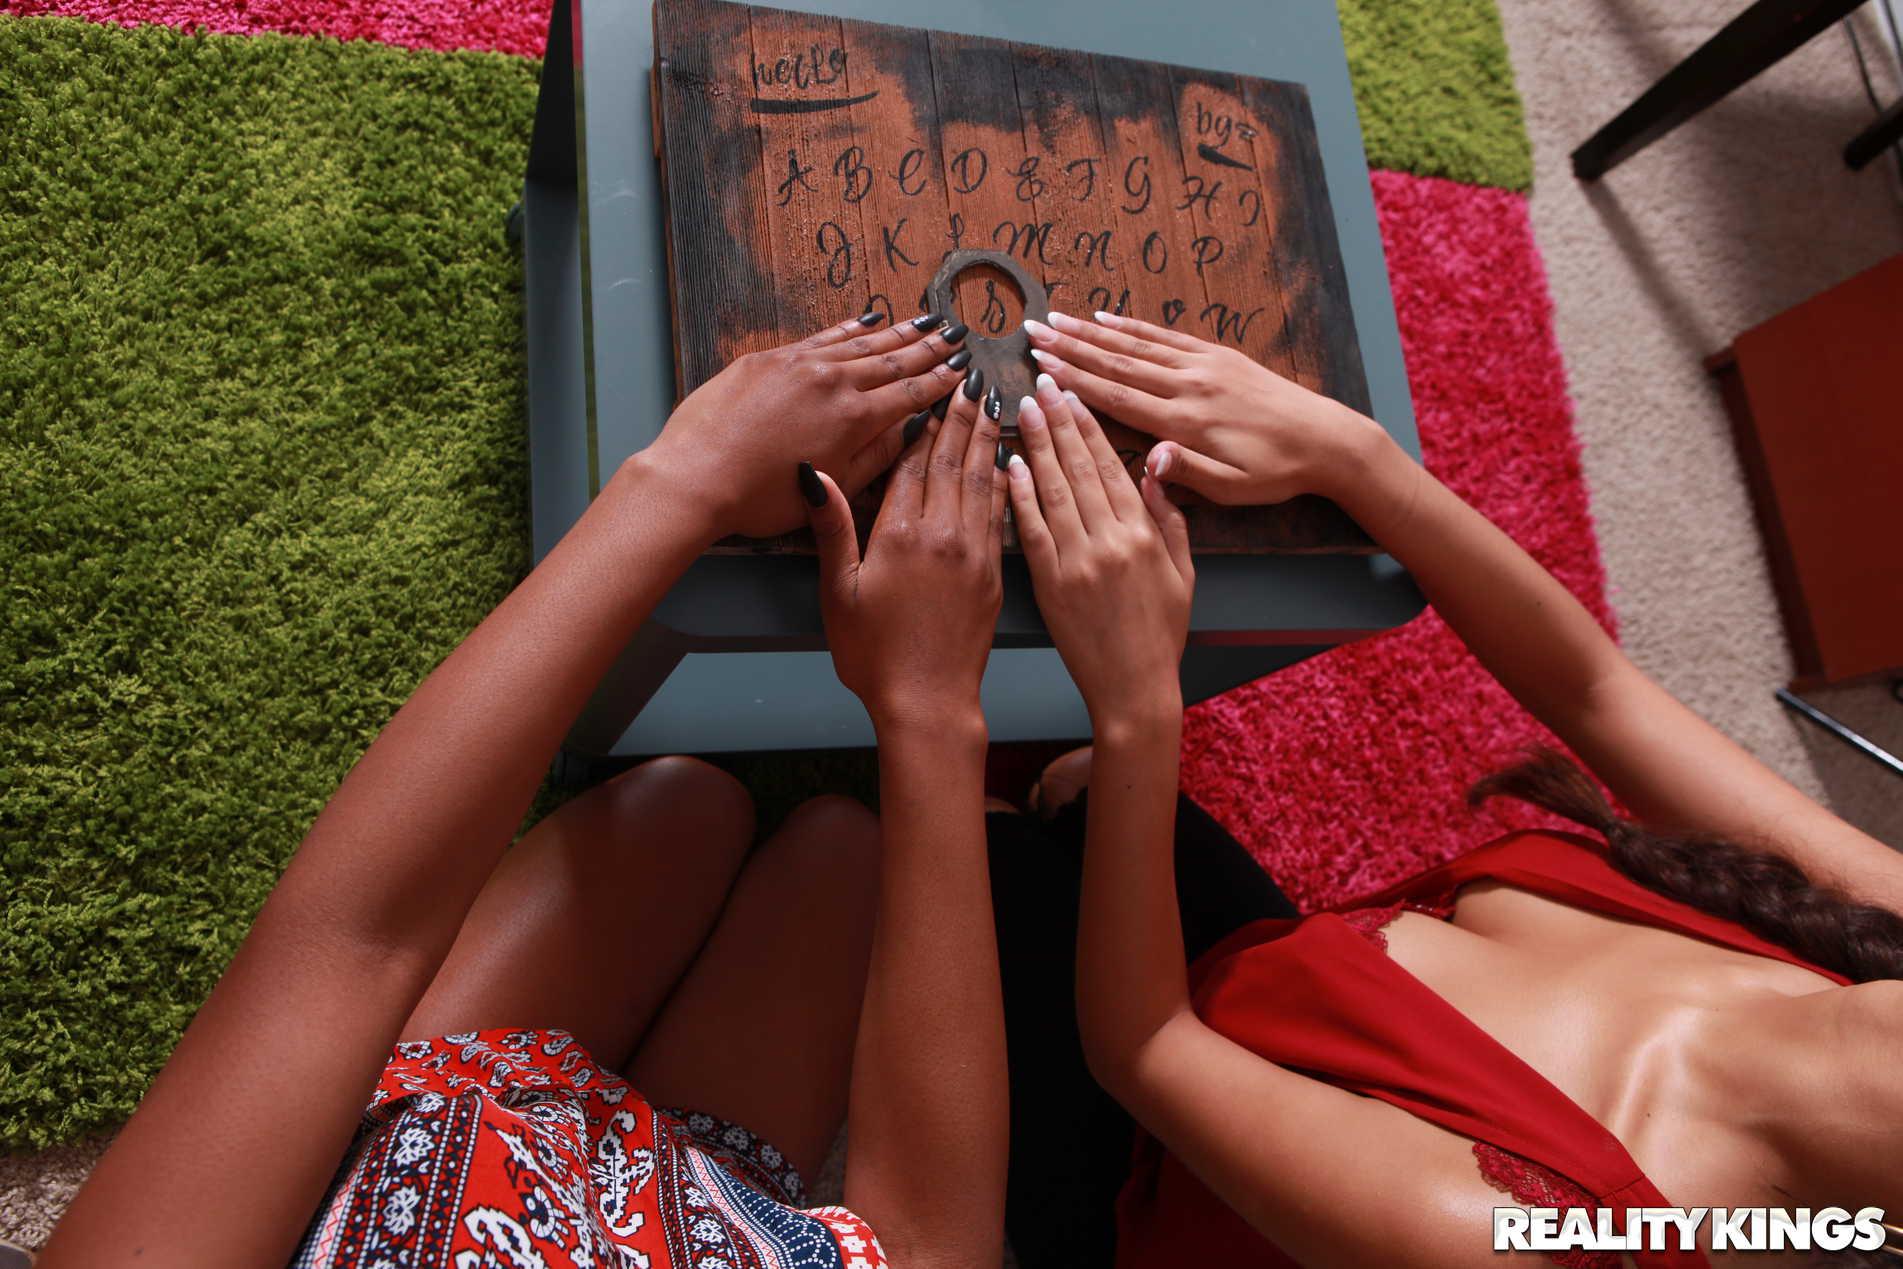 Reality Kings 'Spirit Bored' starring Gianna Dior (Photo 130)